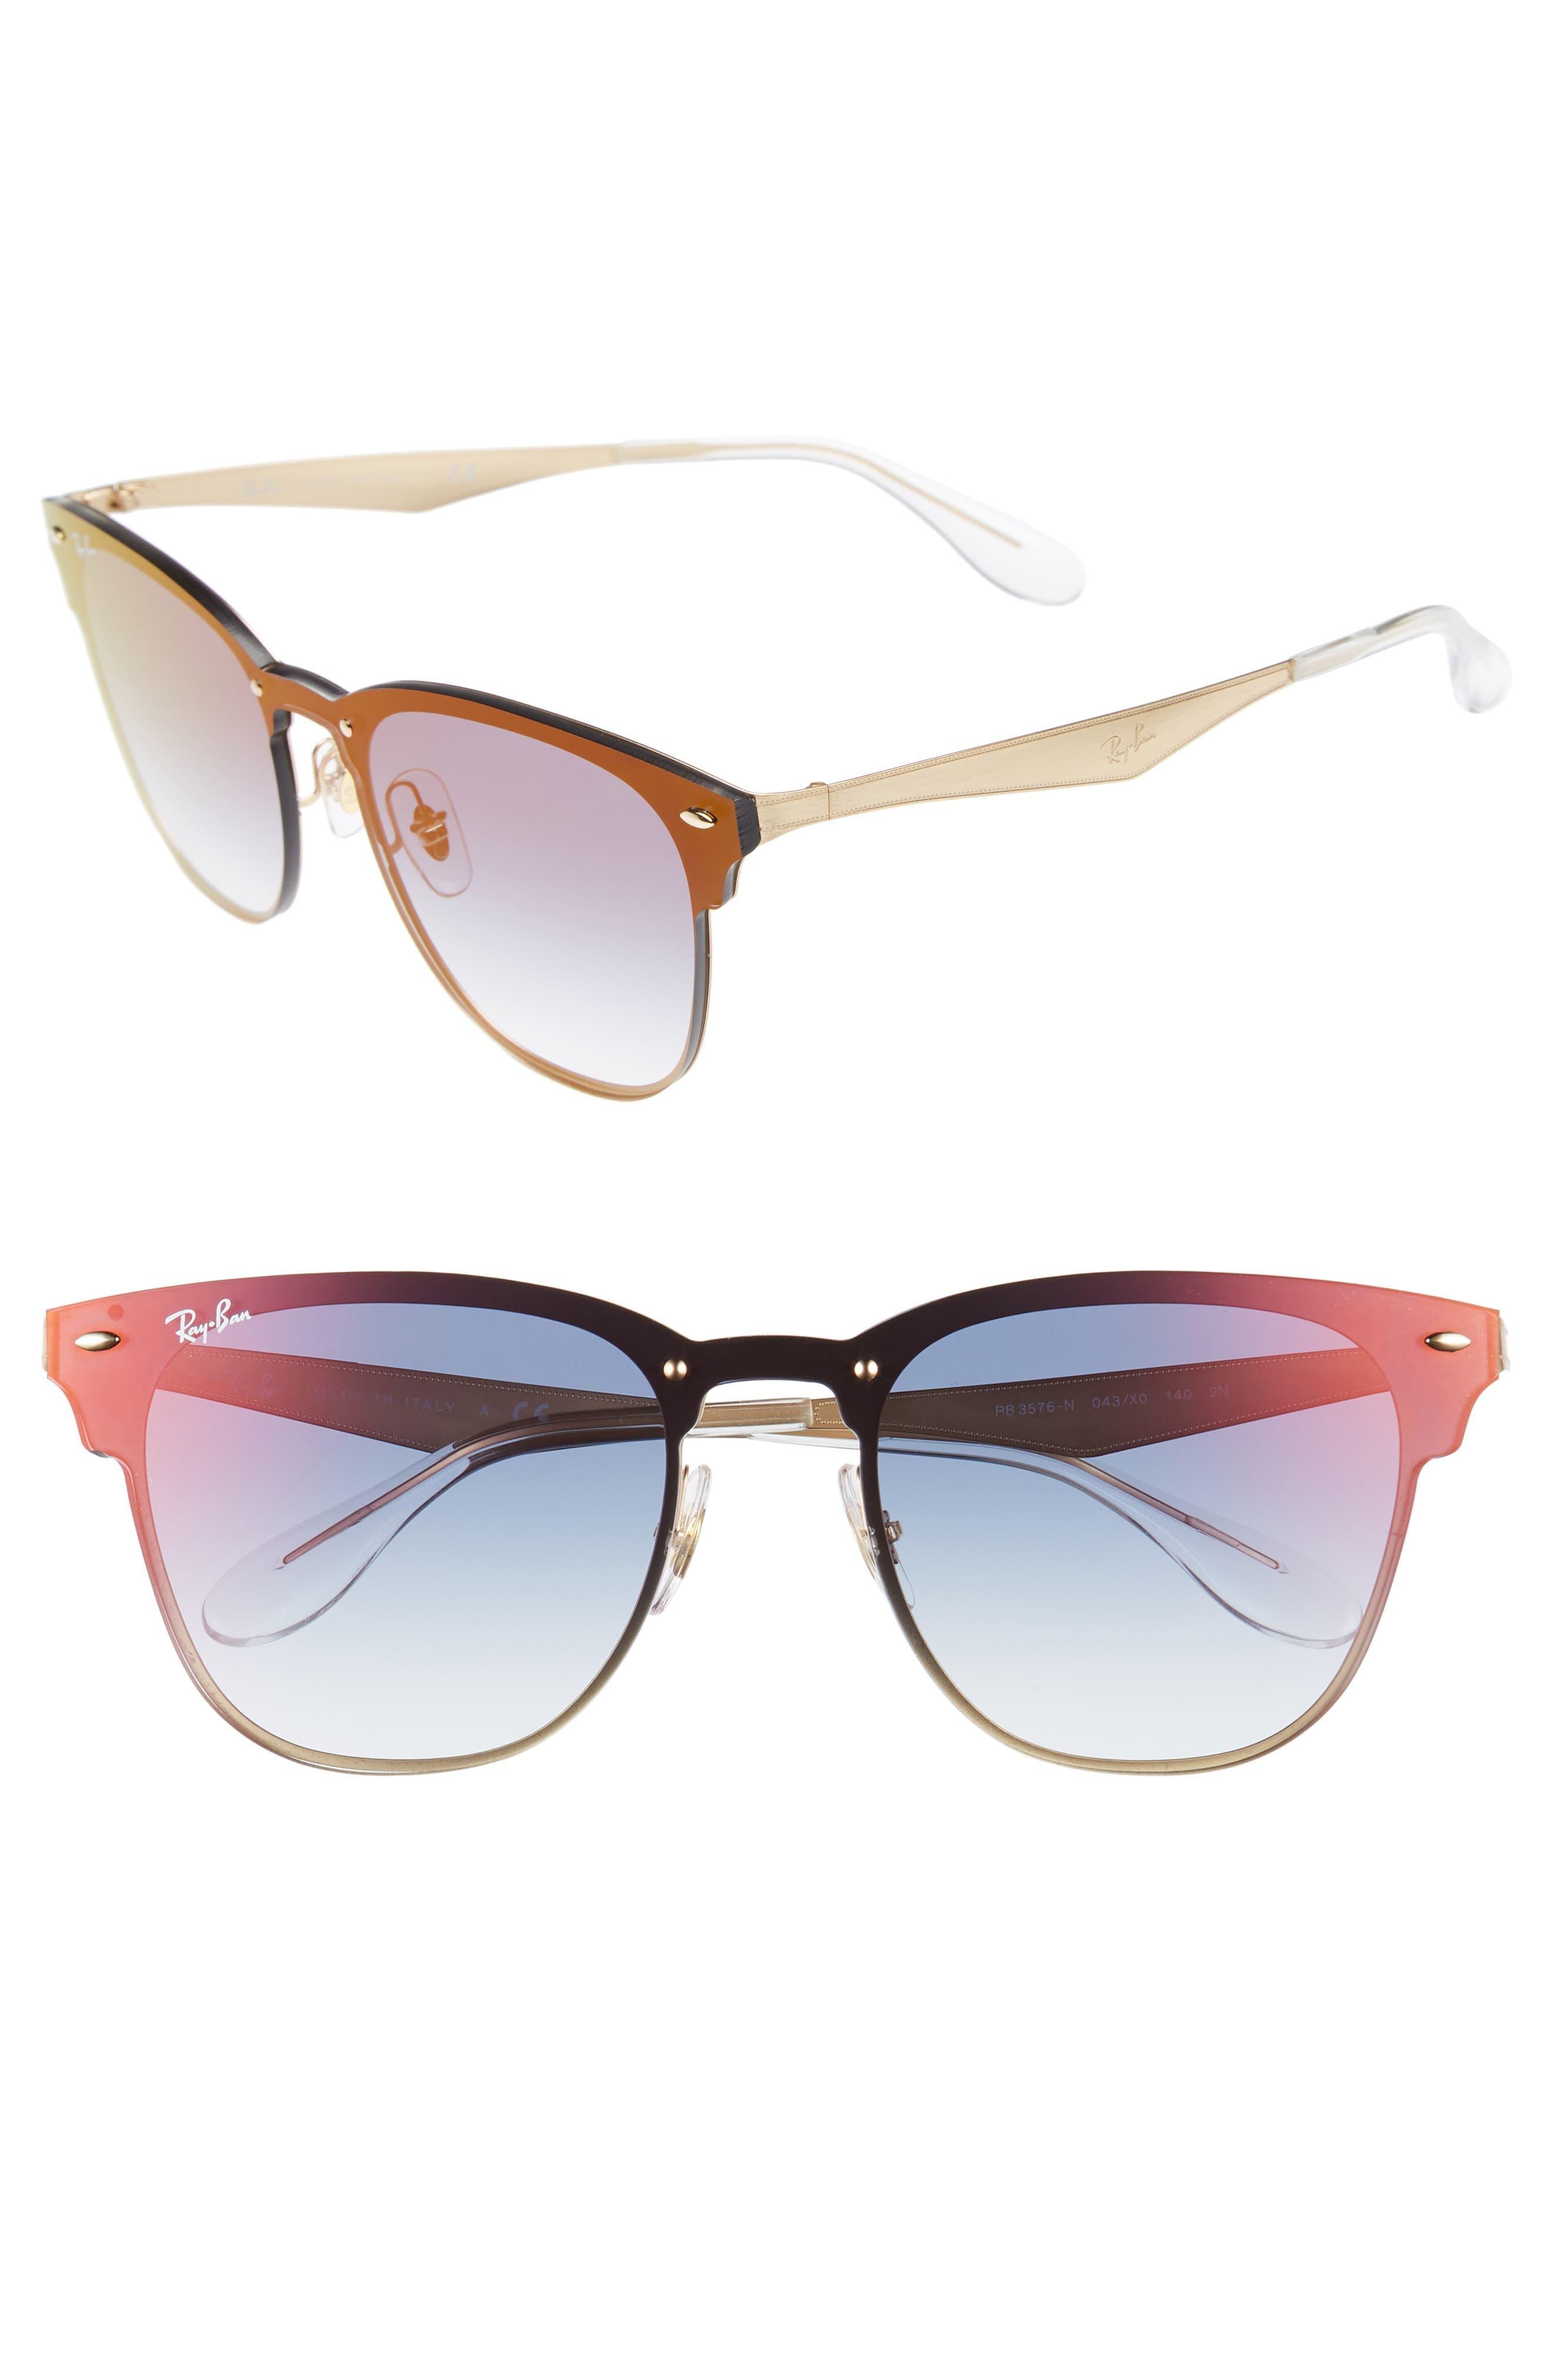 Blaze Clubmaster 47mm Sunglasses,                             Main thumbnail 1, color,                             Gold